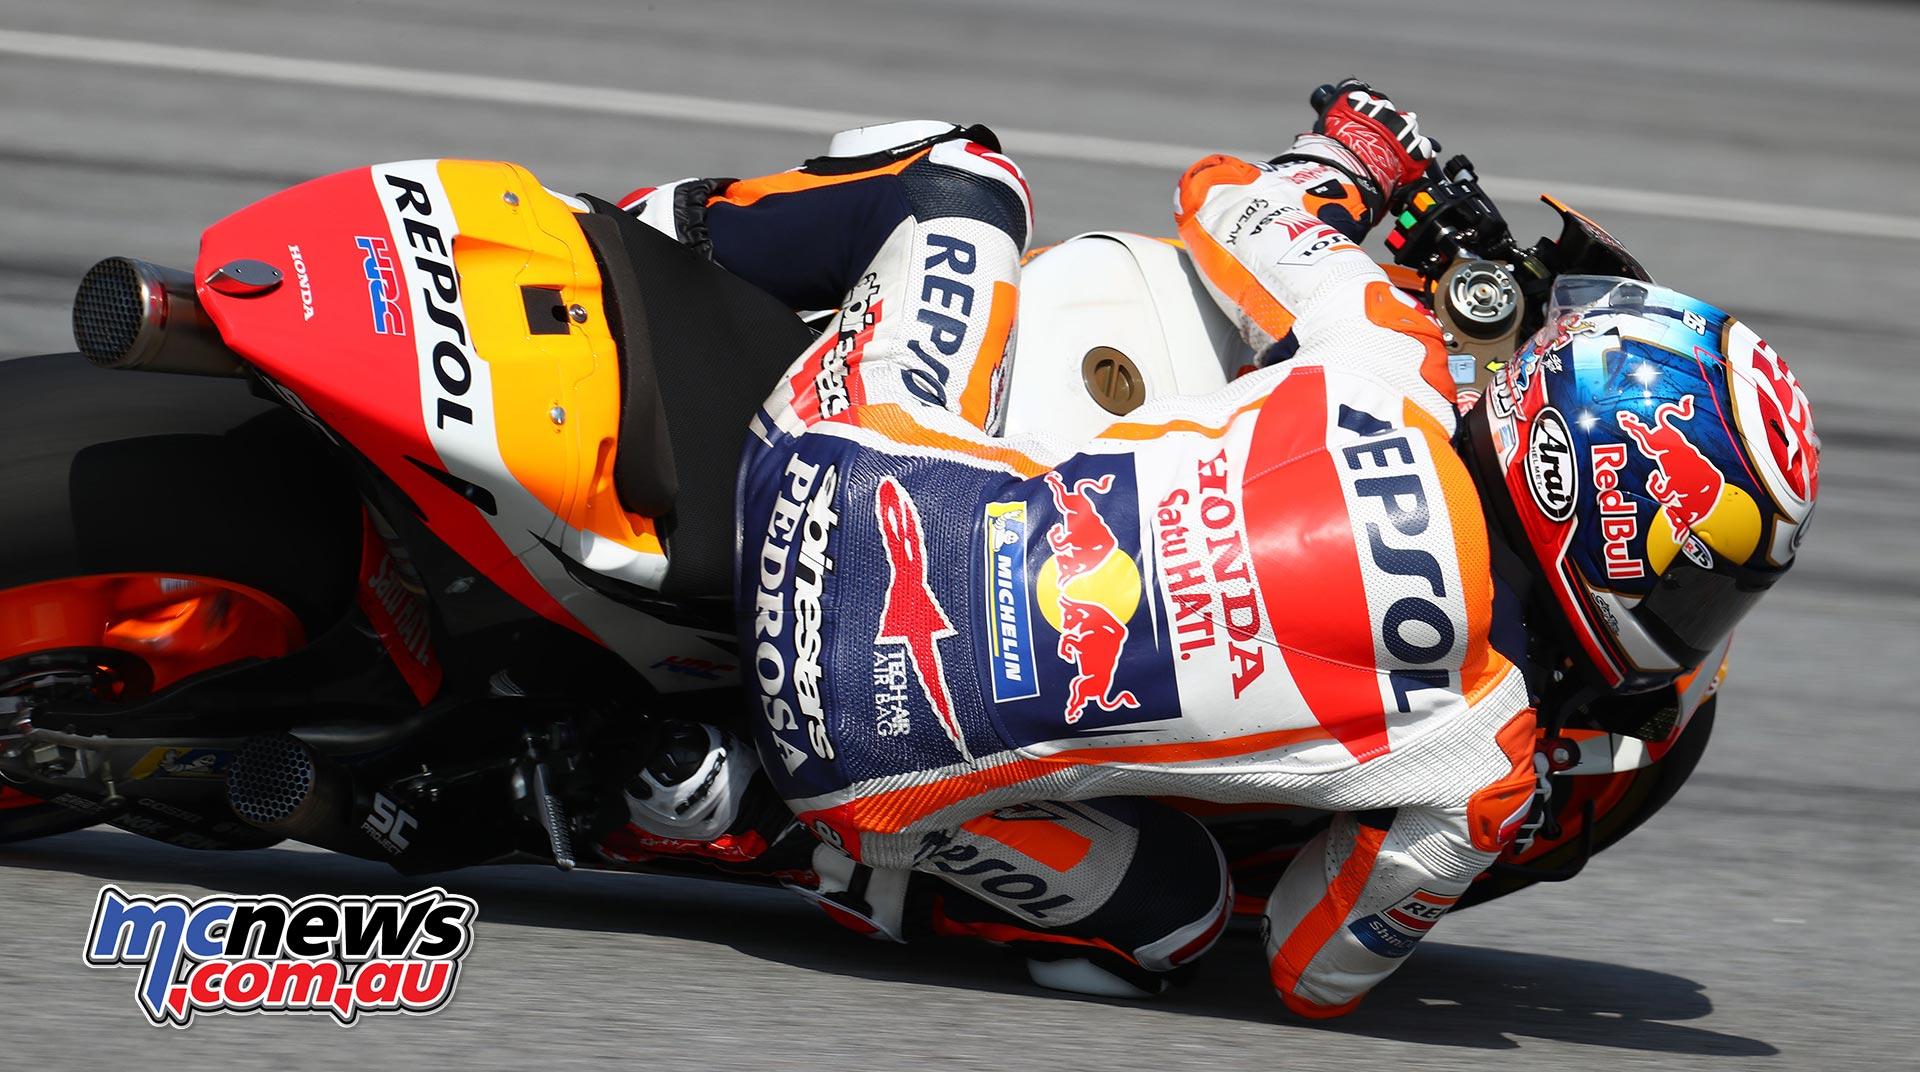 2018 Sepang MotoGP Test | Gallery C | MCNews.com.au